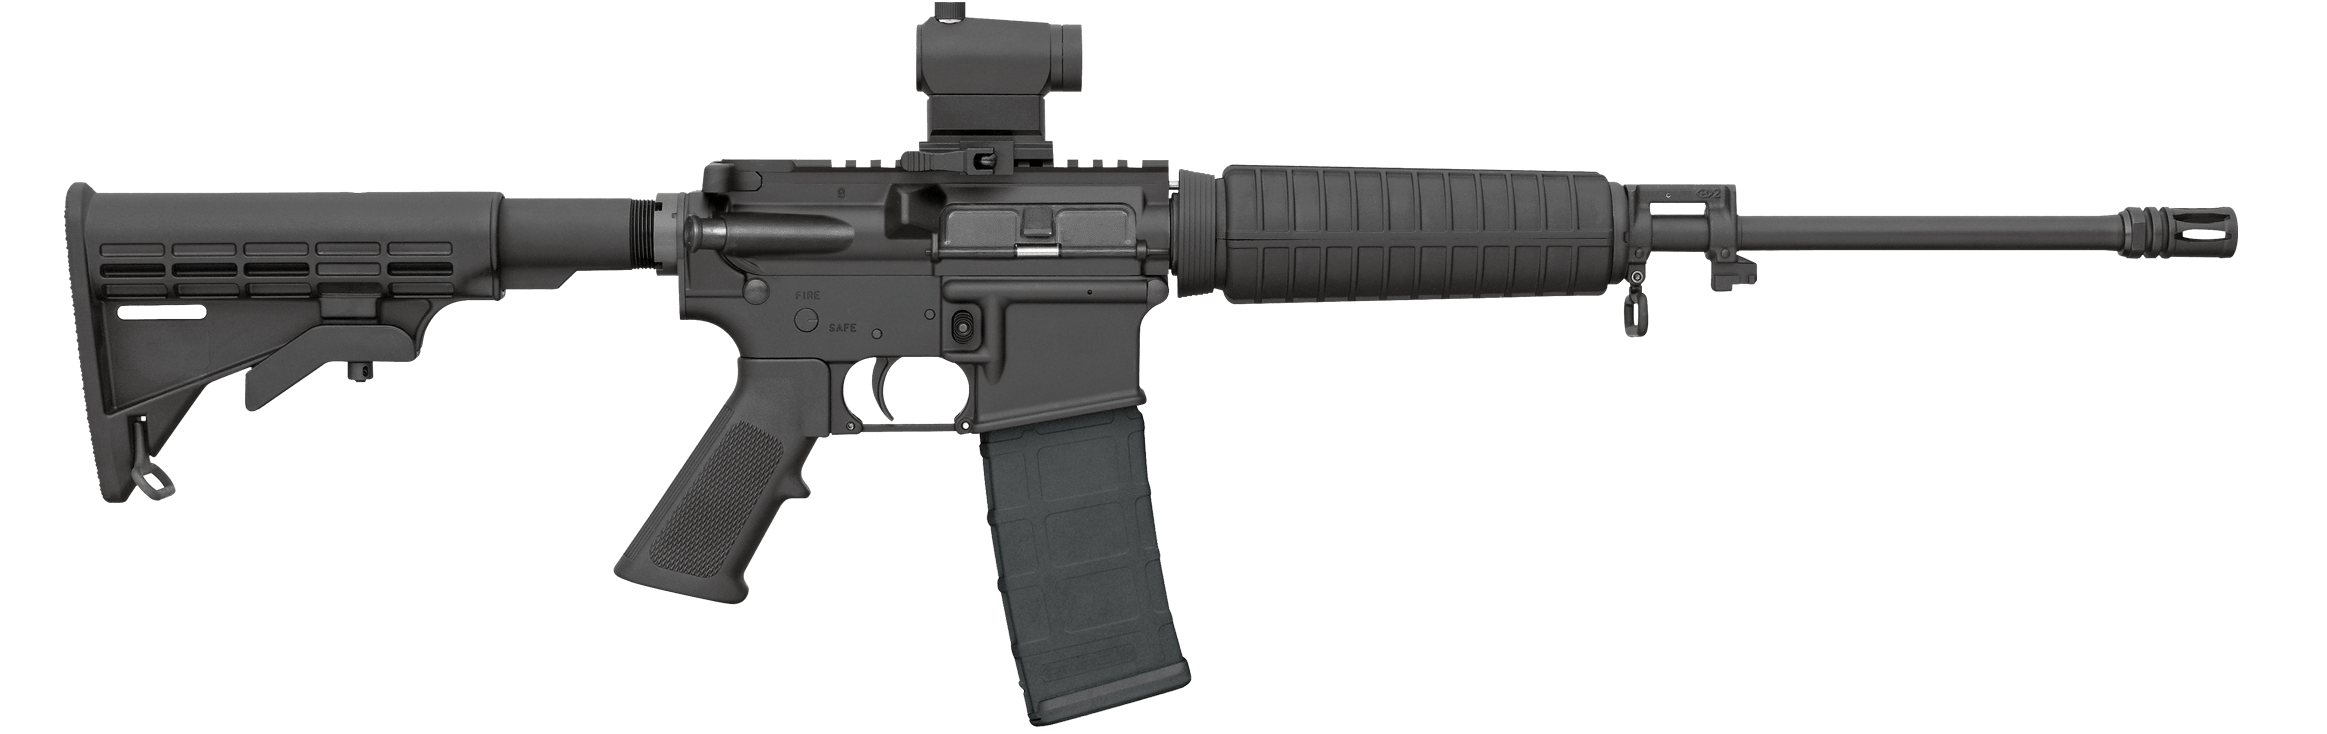 Hunter clipart gun drawing. Bushmaster xm qrc w